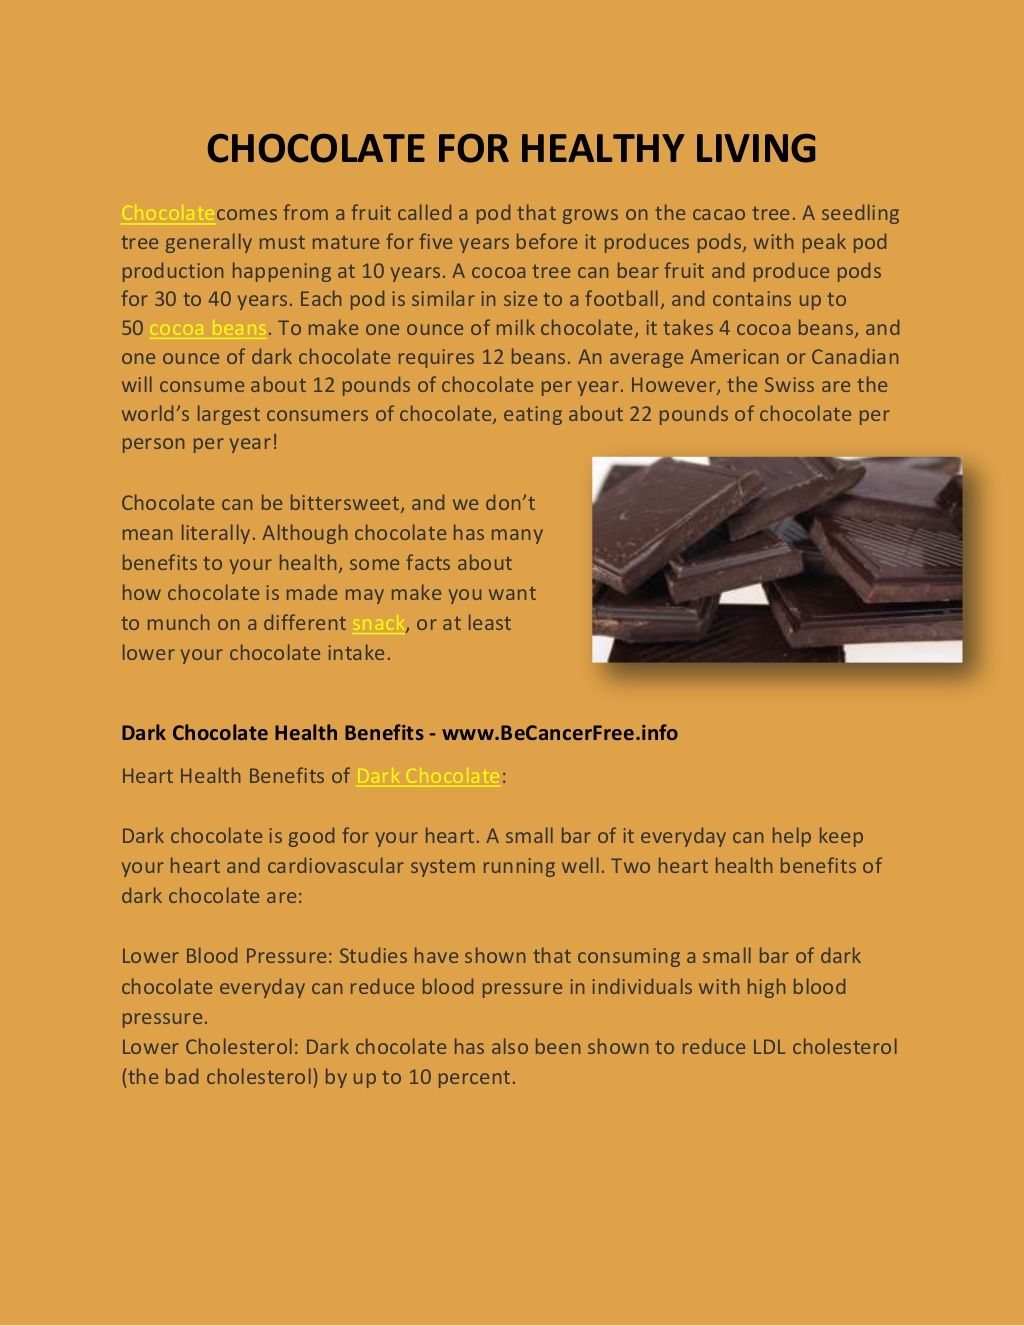 chocolate-20379425 by Arya McLean via Slideshare